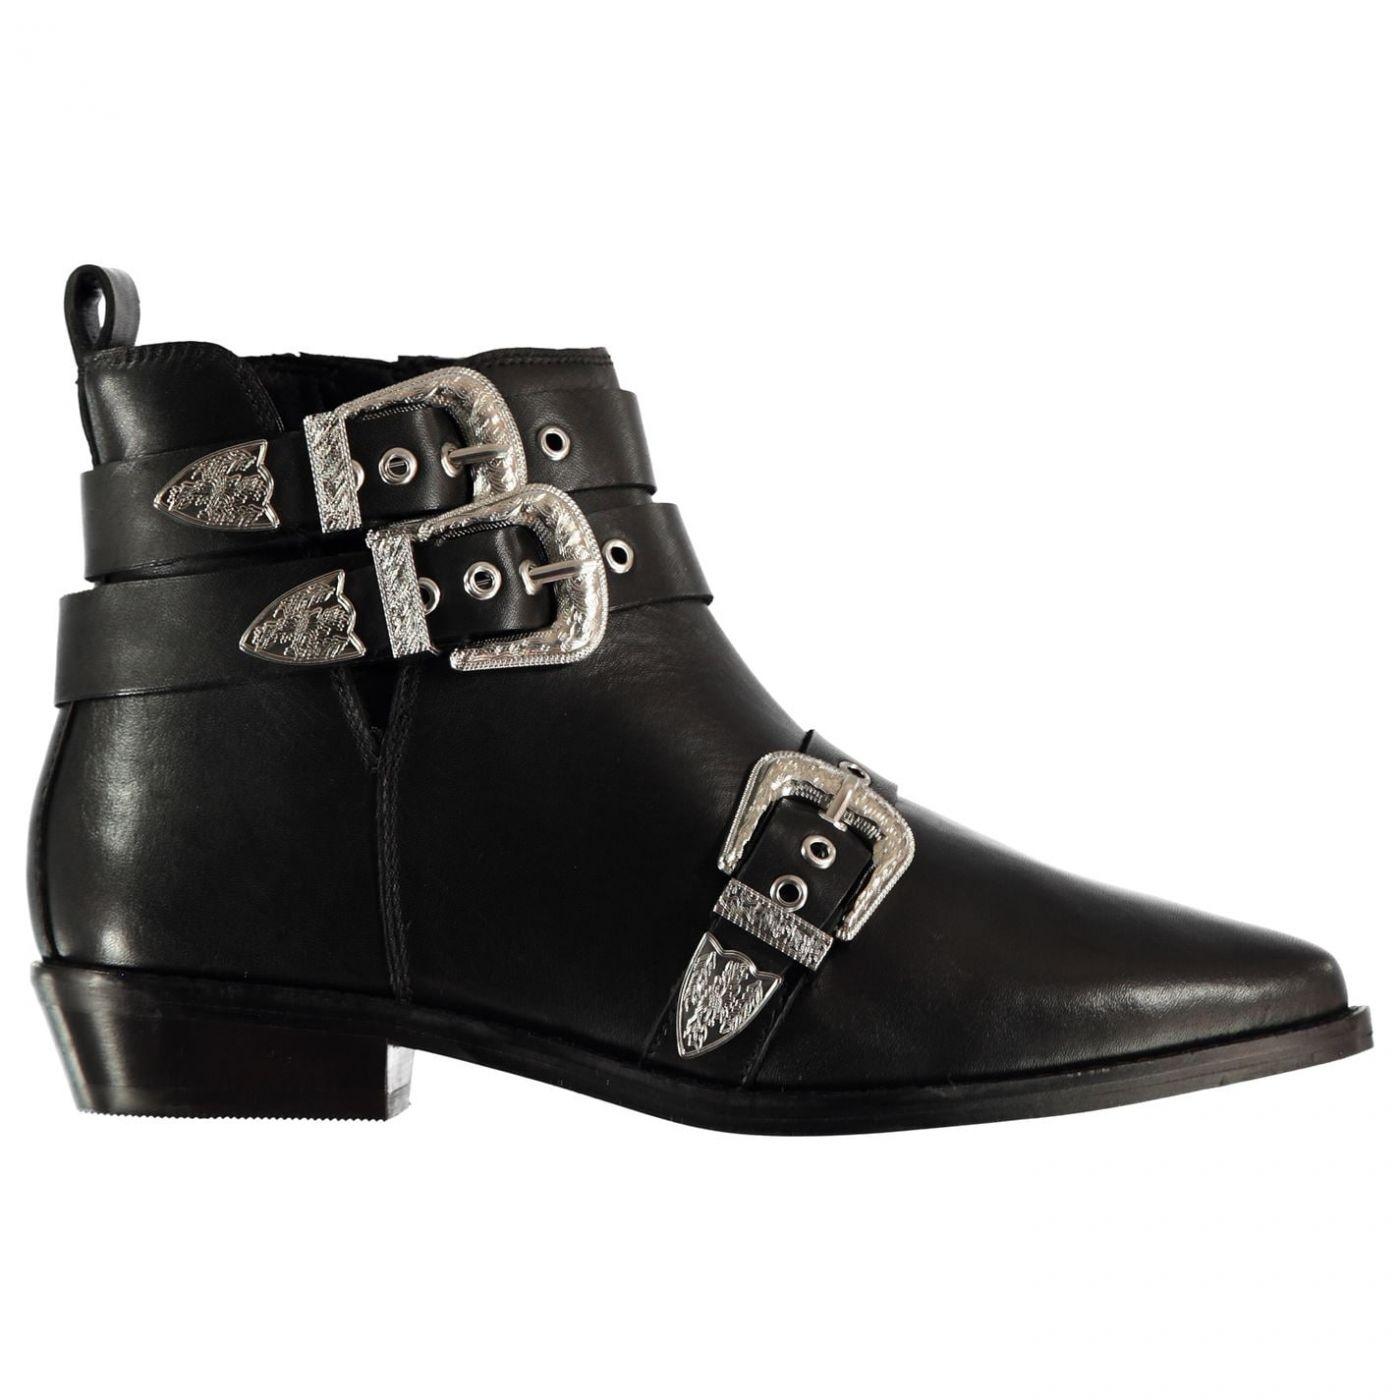 Bronx Buckle Flat Boots Ladies